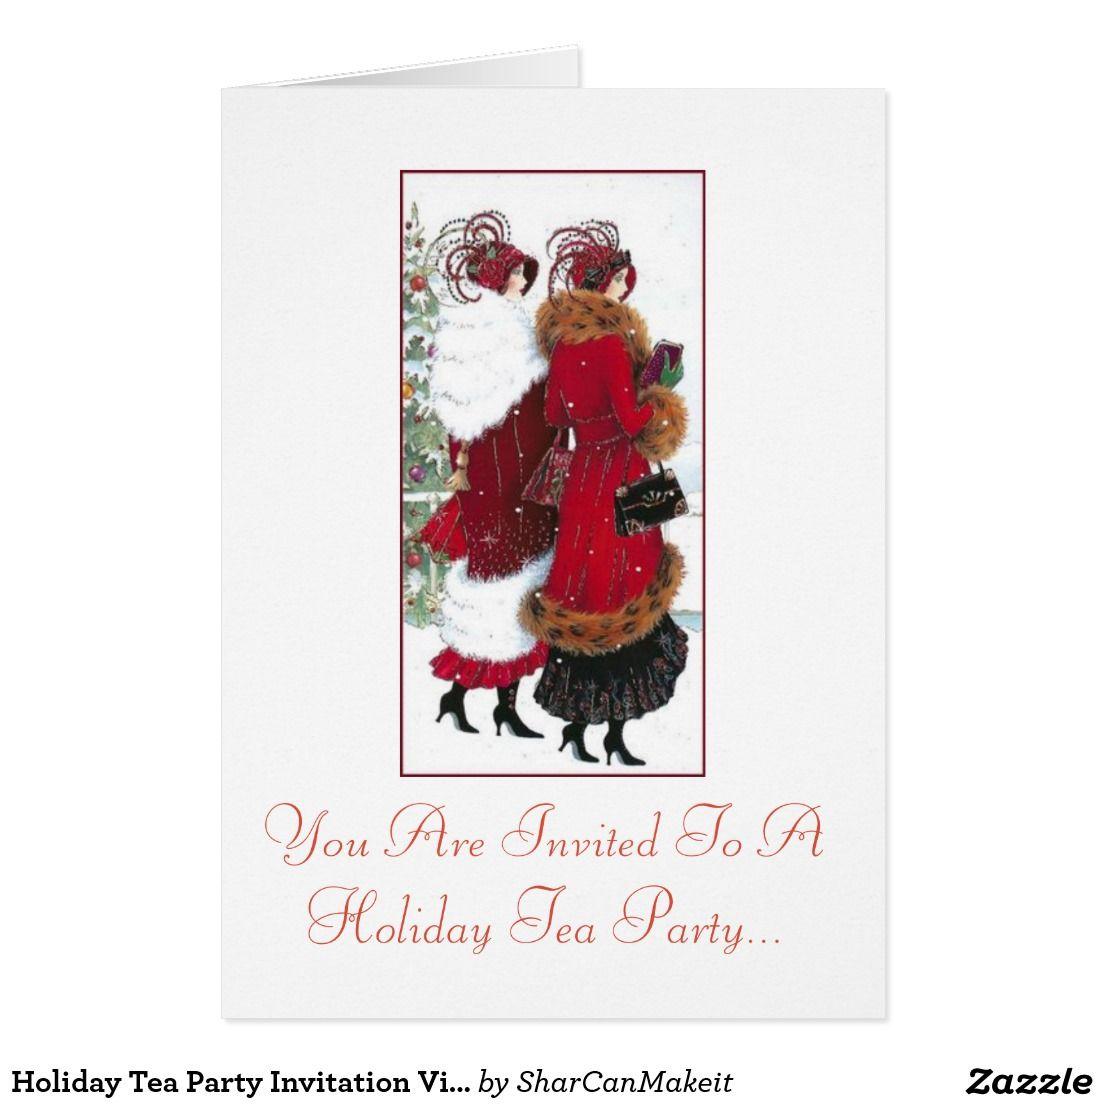 Holiday Tea Party Invitation Vintage ladies | Tea Party Invitiation ...